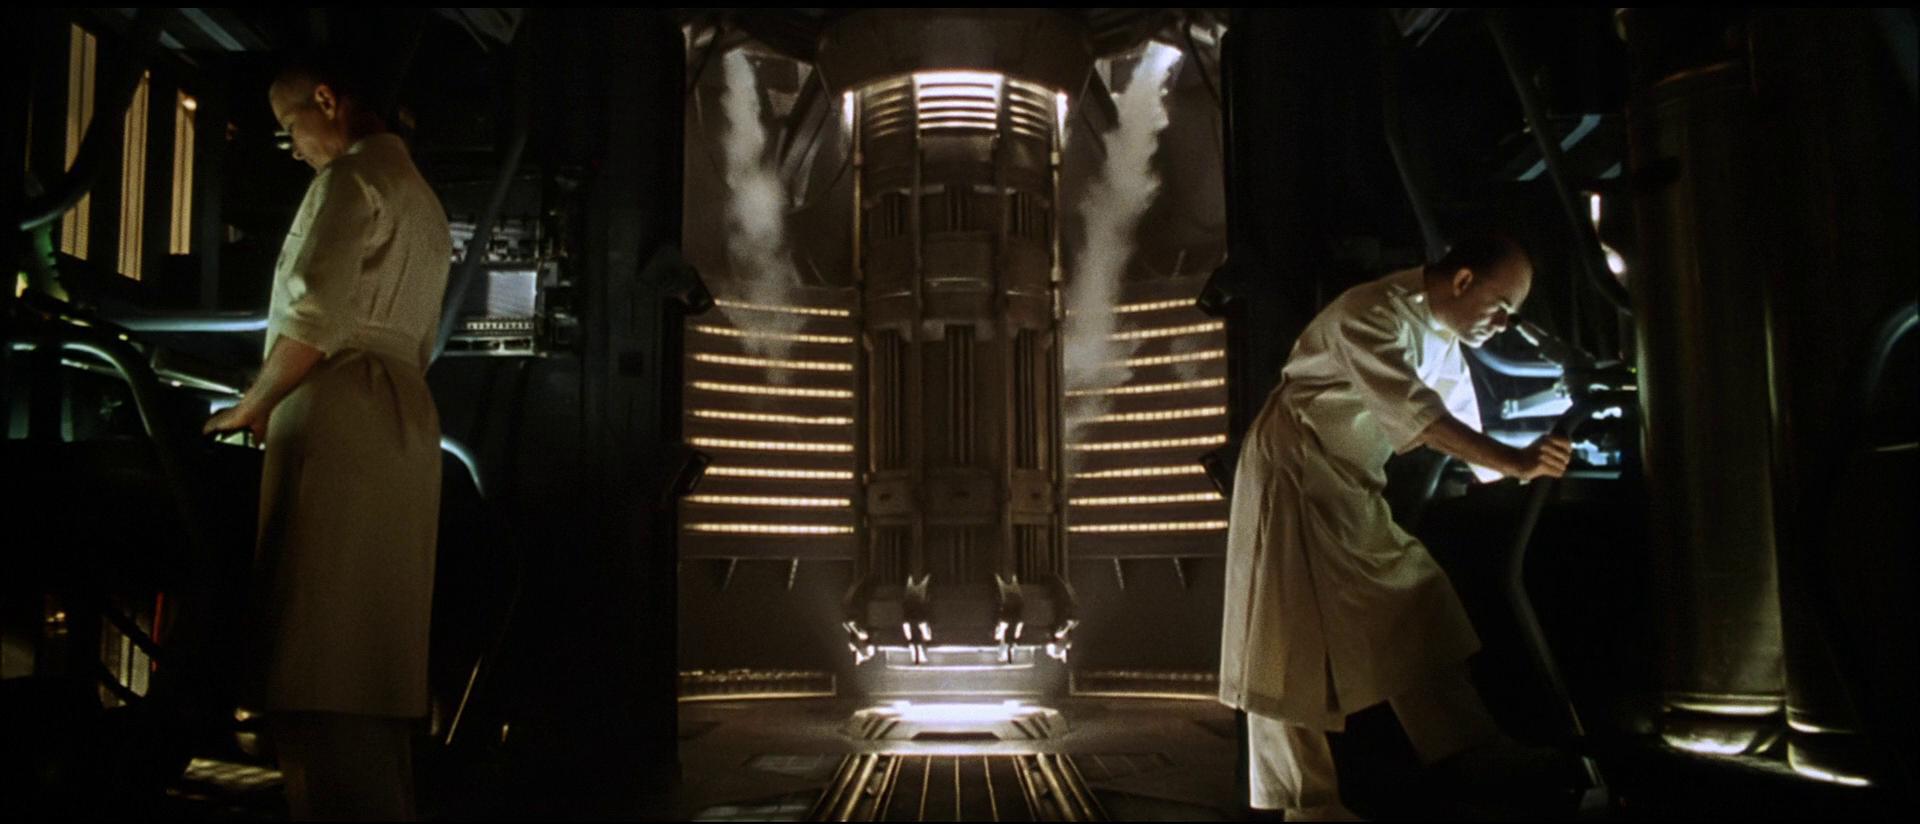 Moviery Com Download The Movie Alien Resurrection